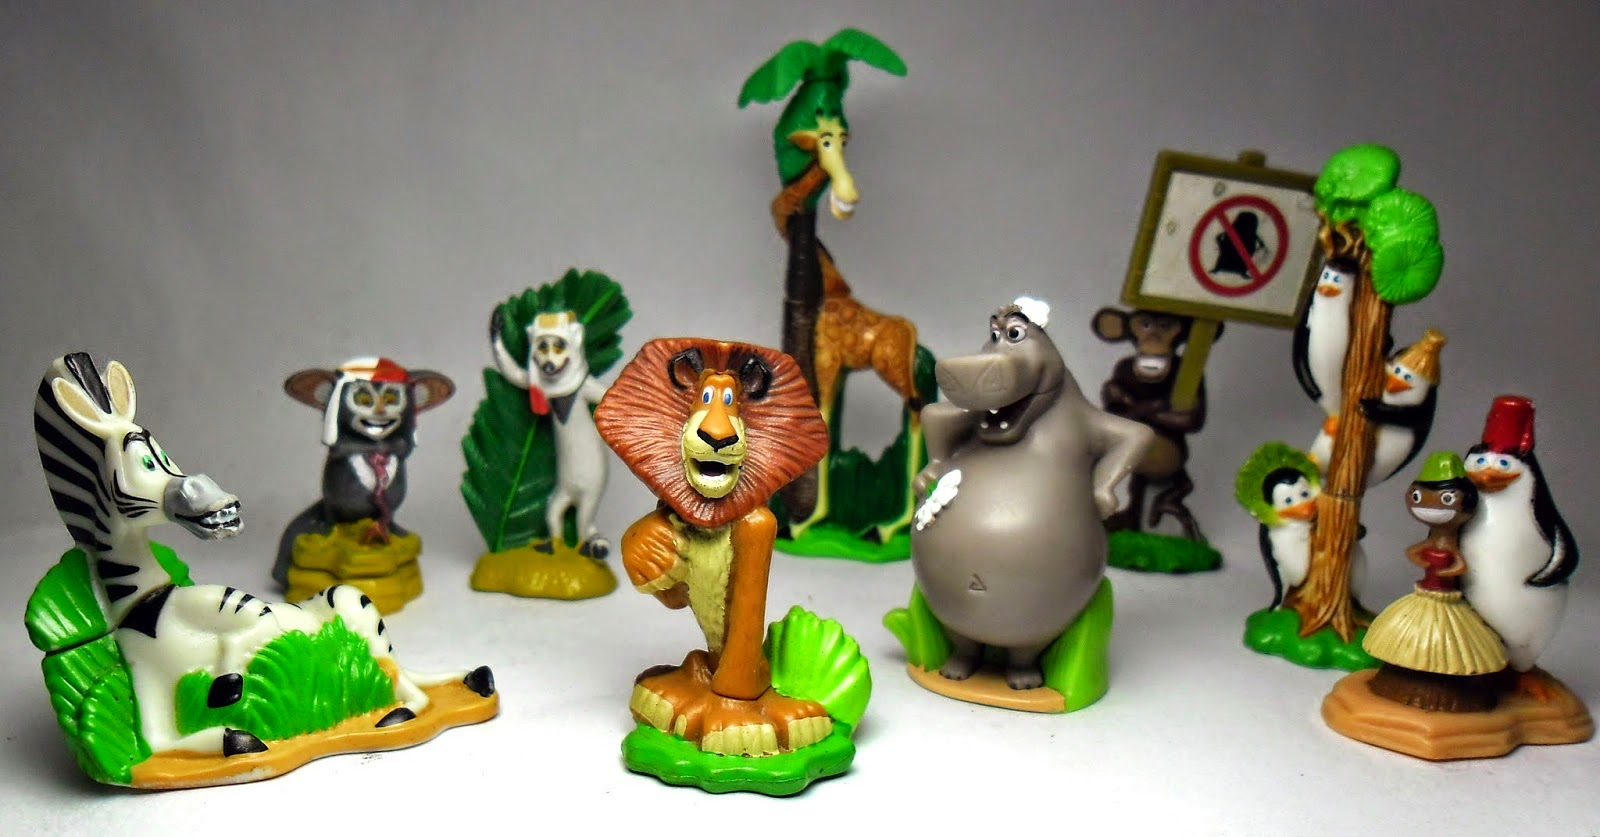 http://juguetesdelcoleccionista.blogspot.com.ar/2014/05/madagascar-2-escape-to-africa-kinder.html